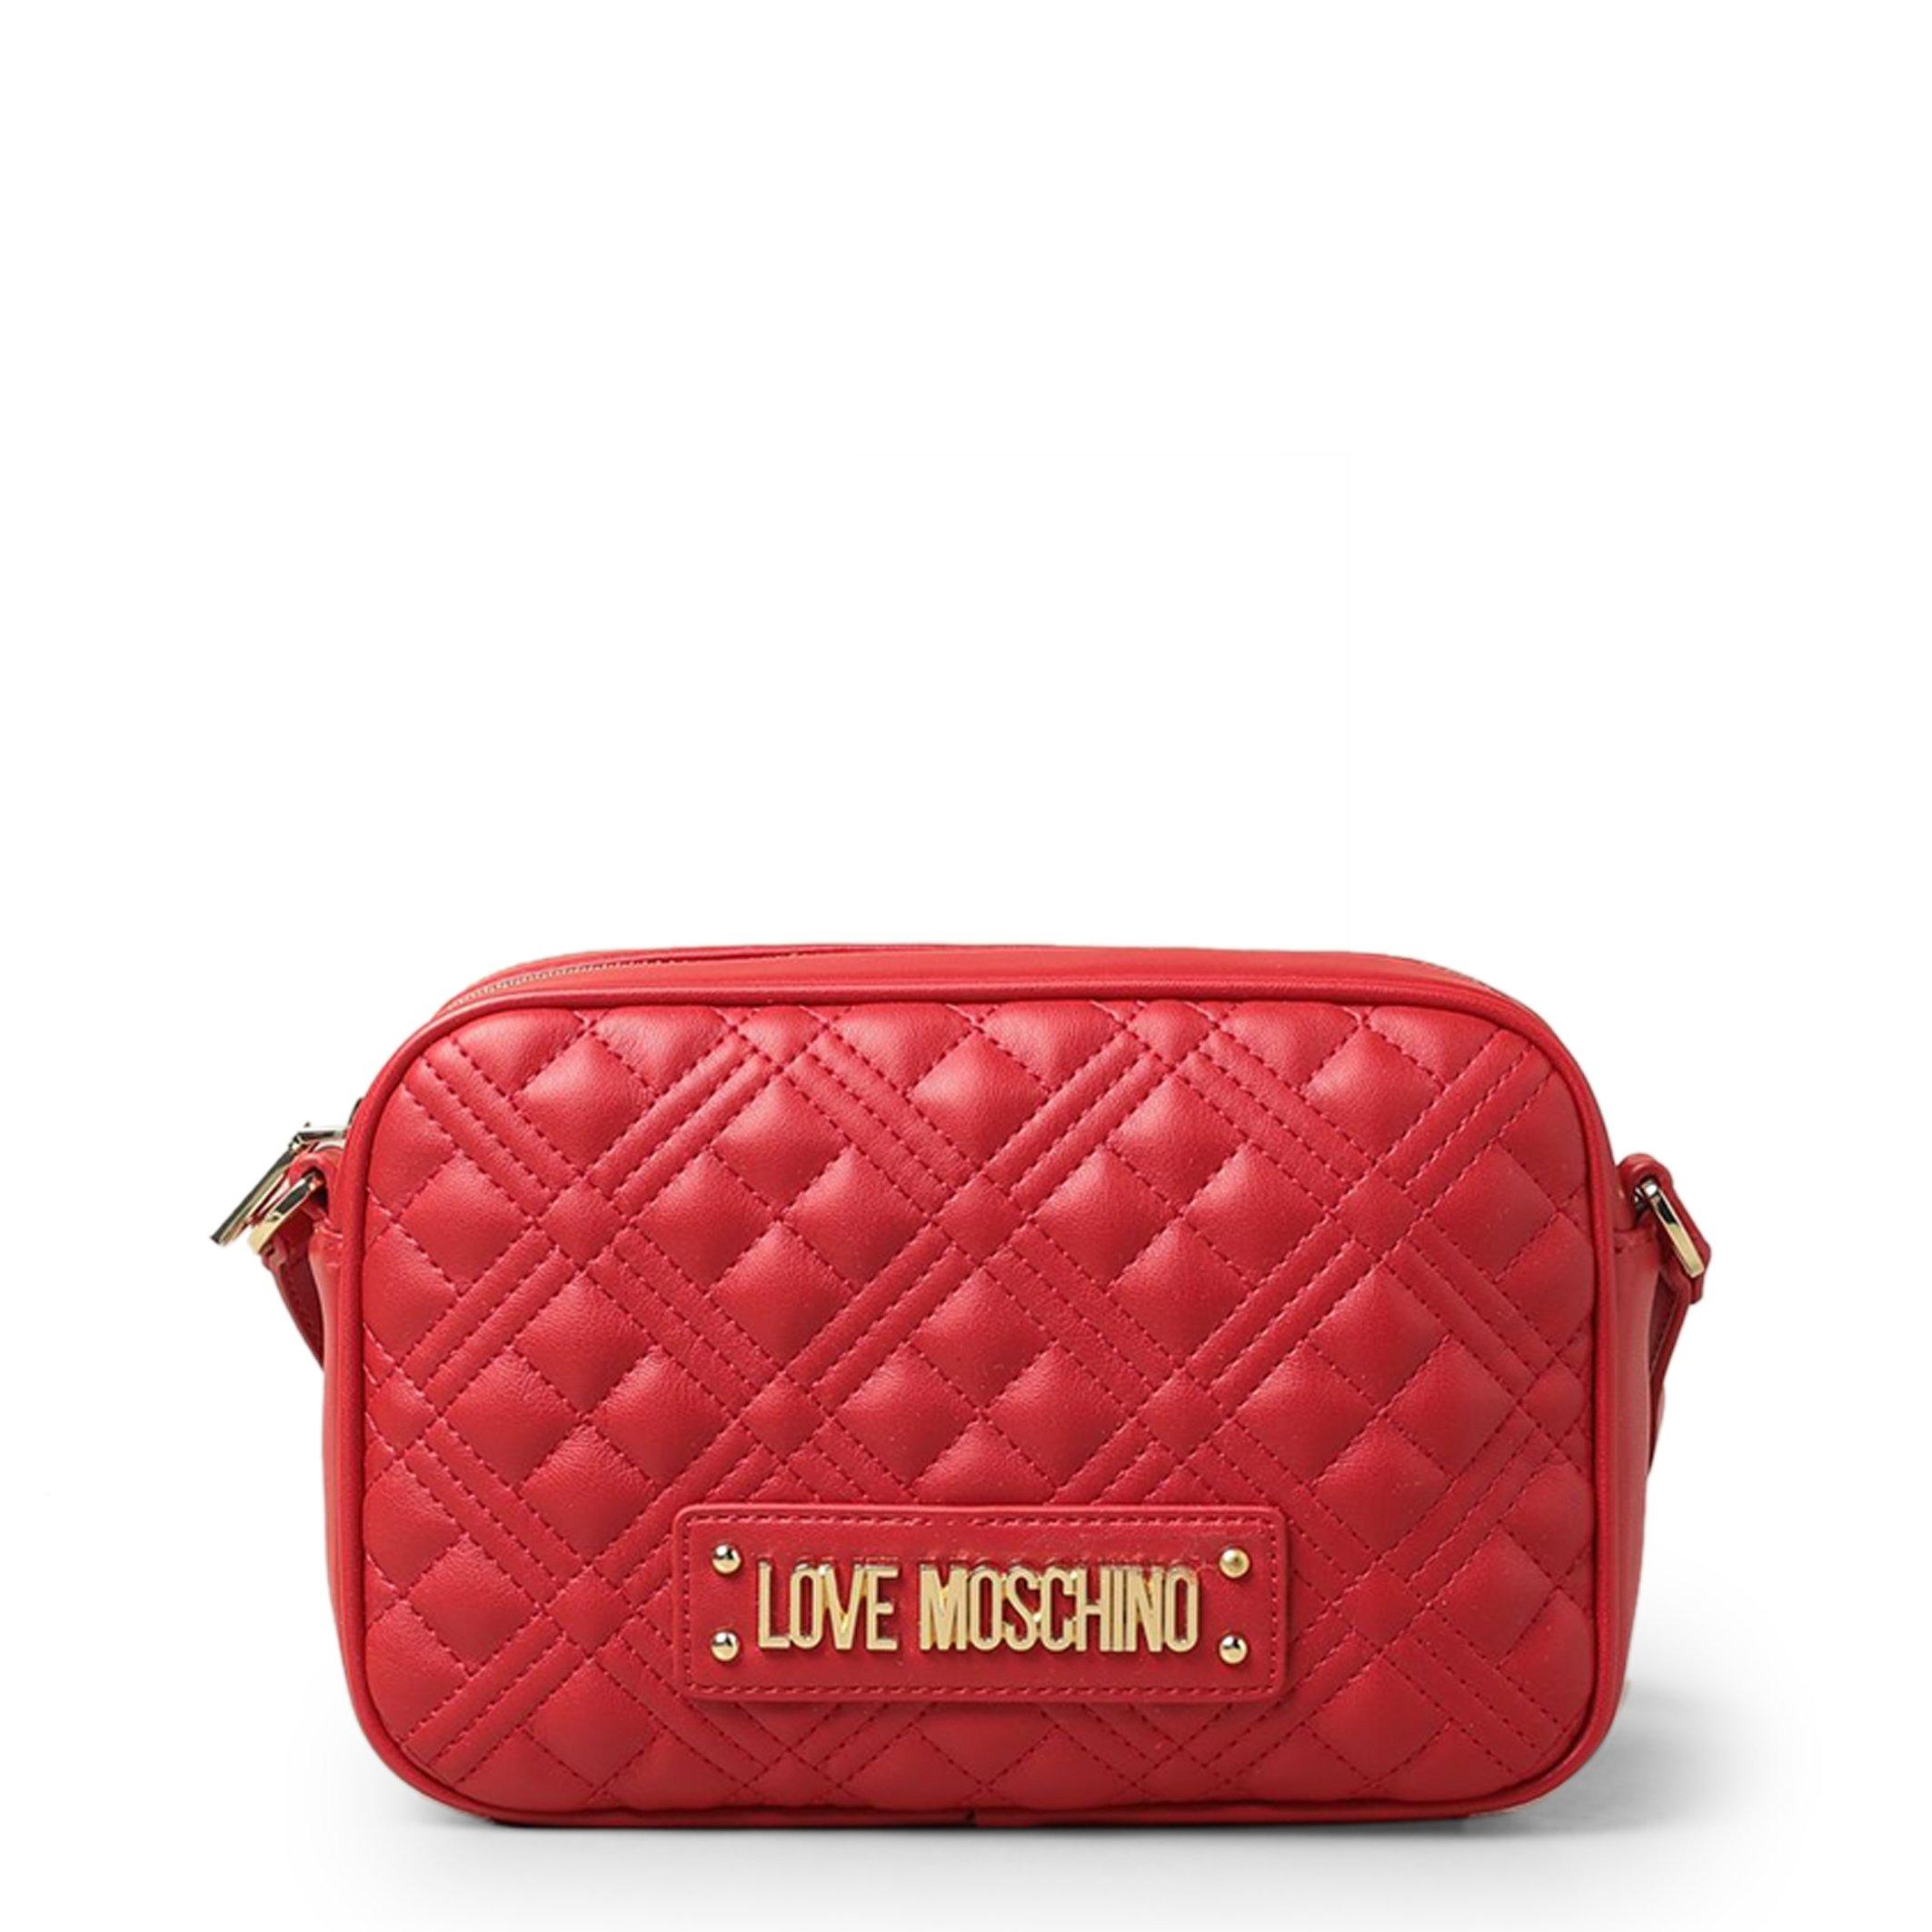 Love Moschino Women's Crossbody Bag Various Colours JC4010PP0CLA0 - red NOSIZE